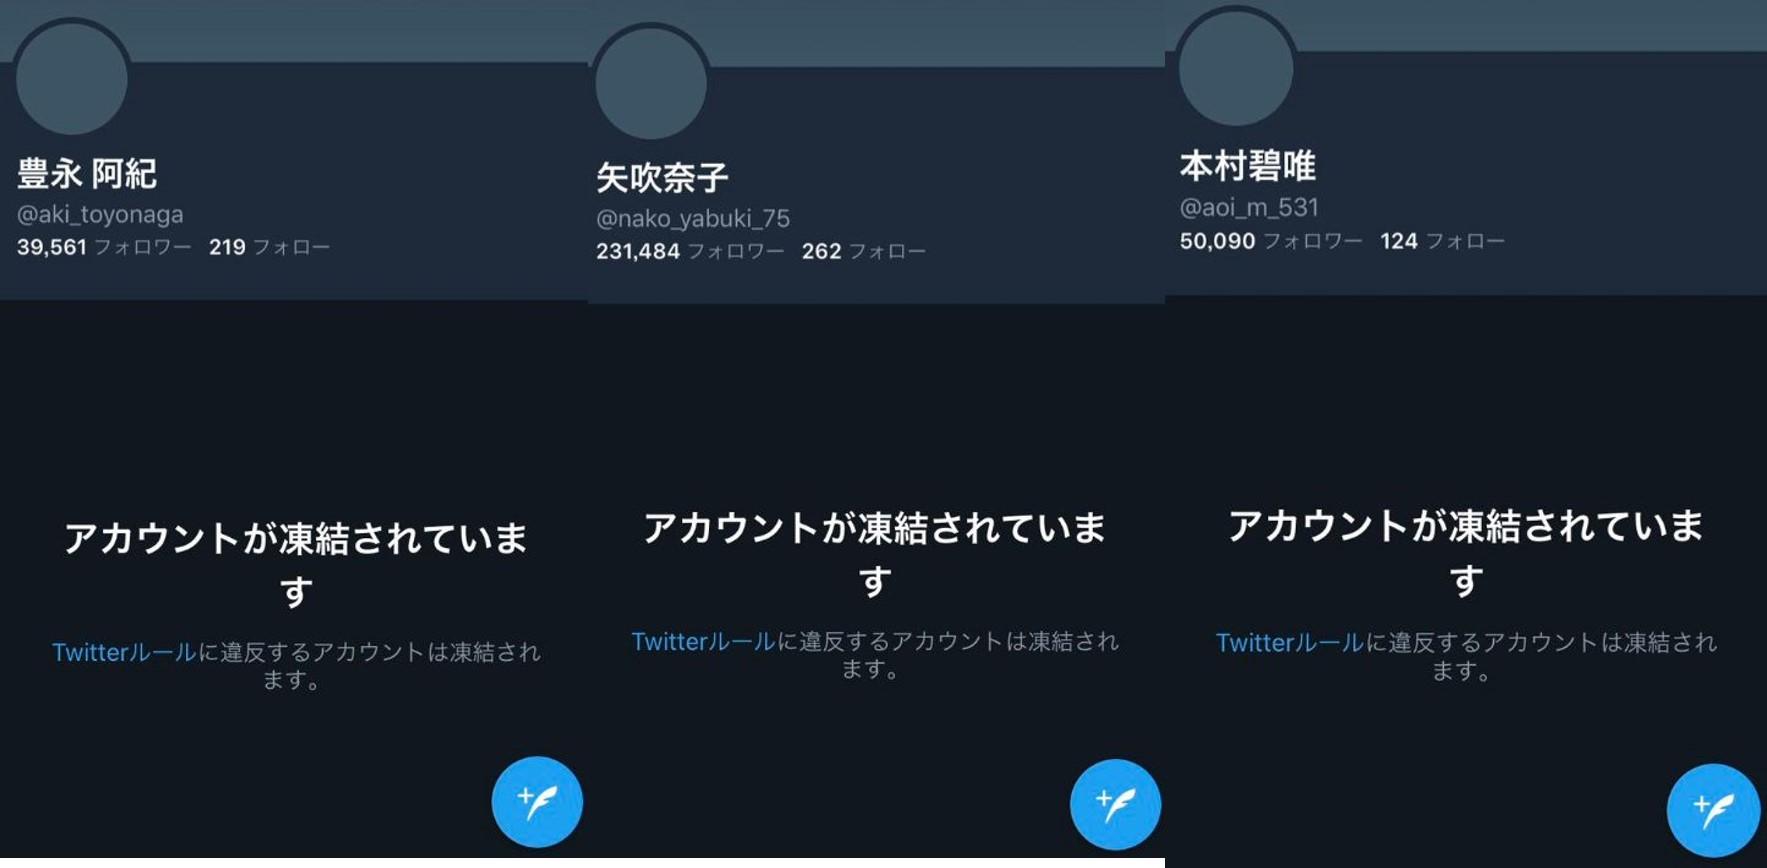 NGT暴行 Twitter 凍結